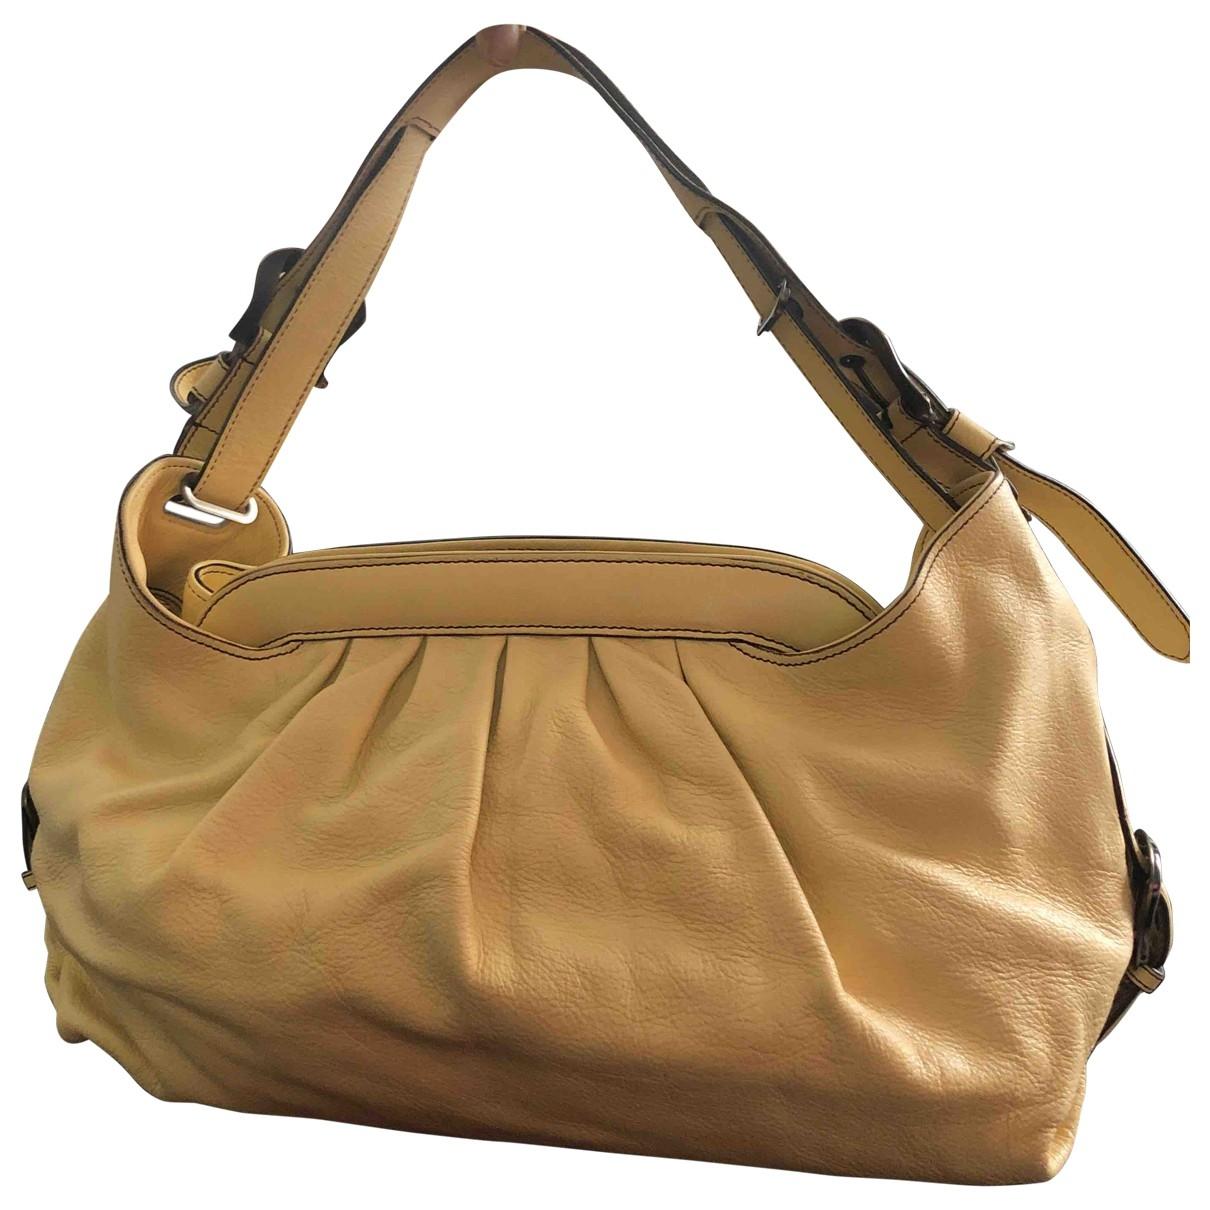 Fendi \N Yellow Leather handbag for Women \N